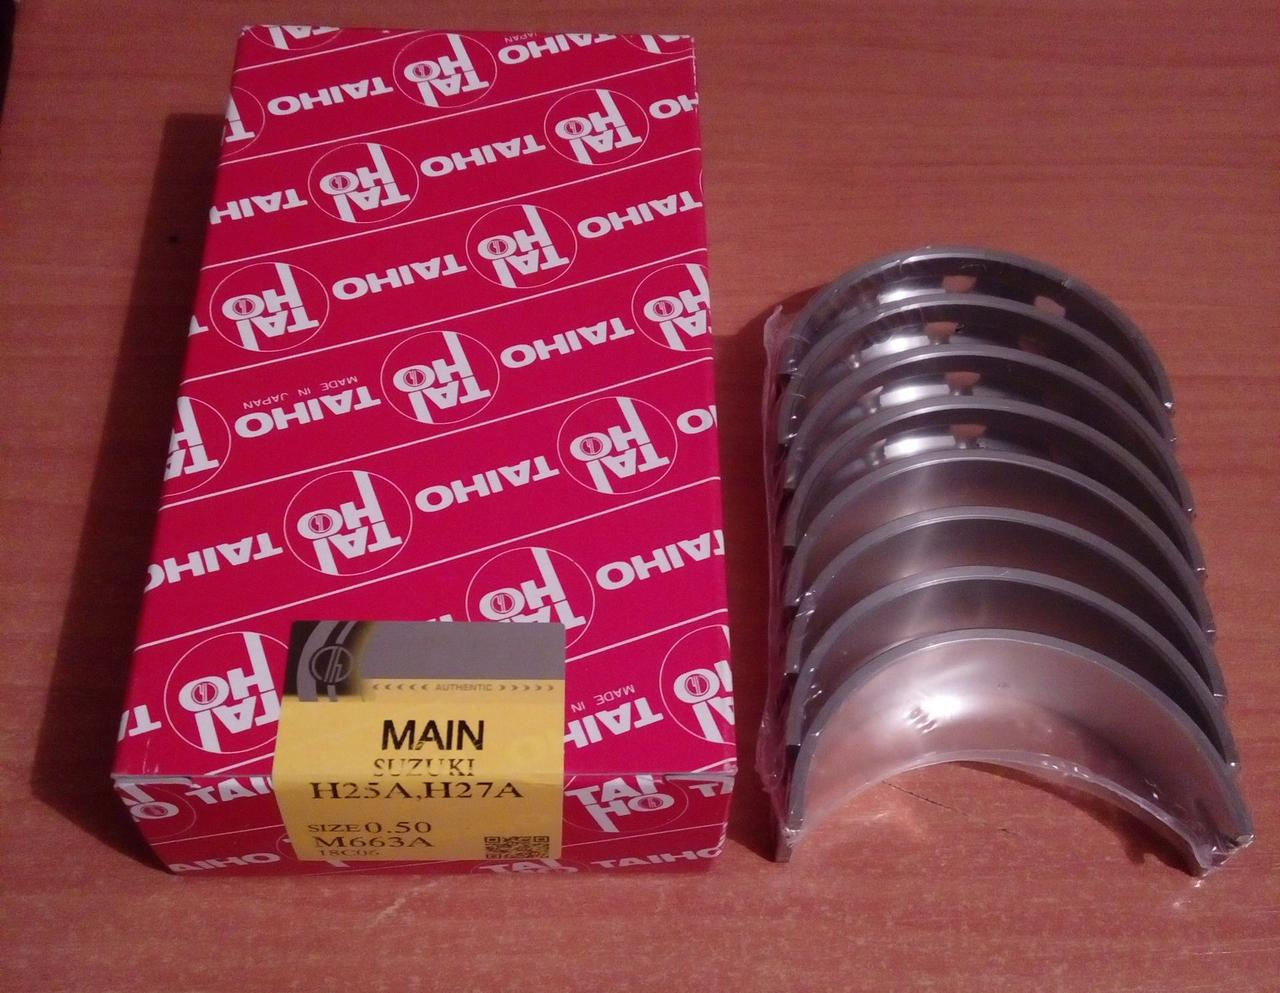 Вкладыши коренные 0,50 TAIHO M663A050 (#12300-86812-050) комплект 4шт.